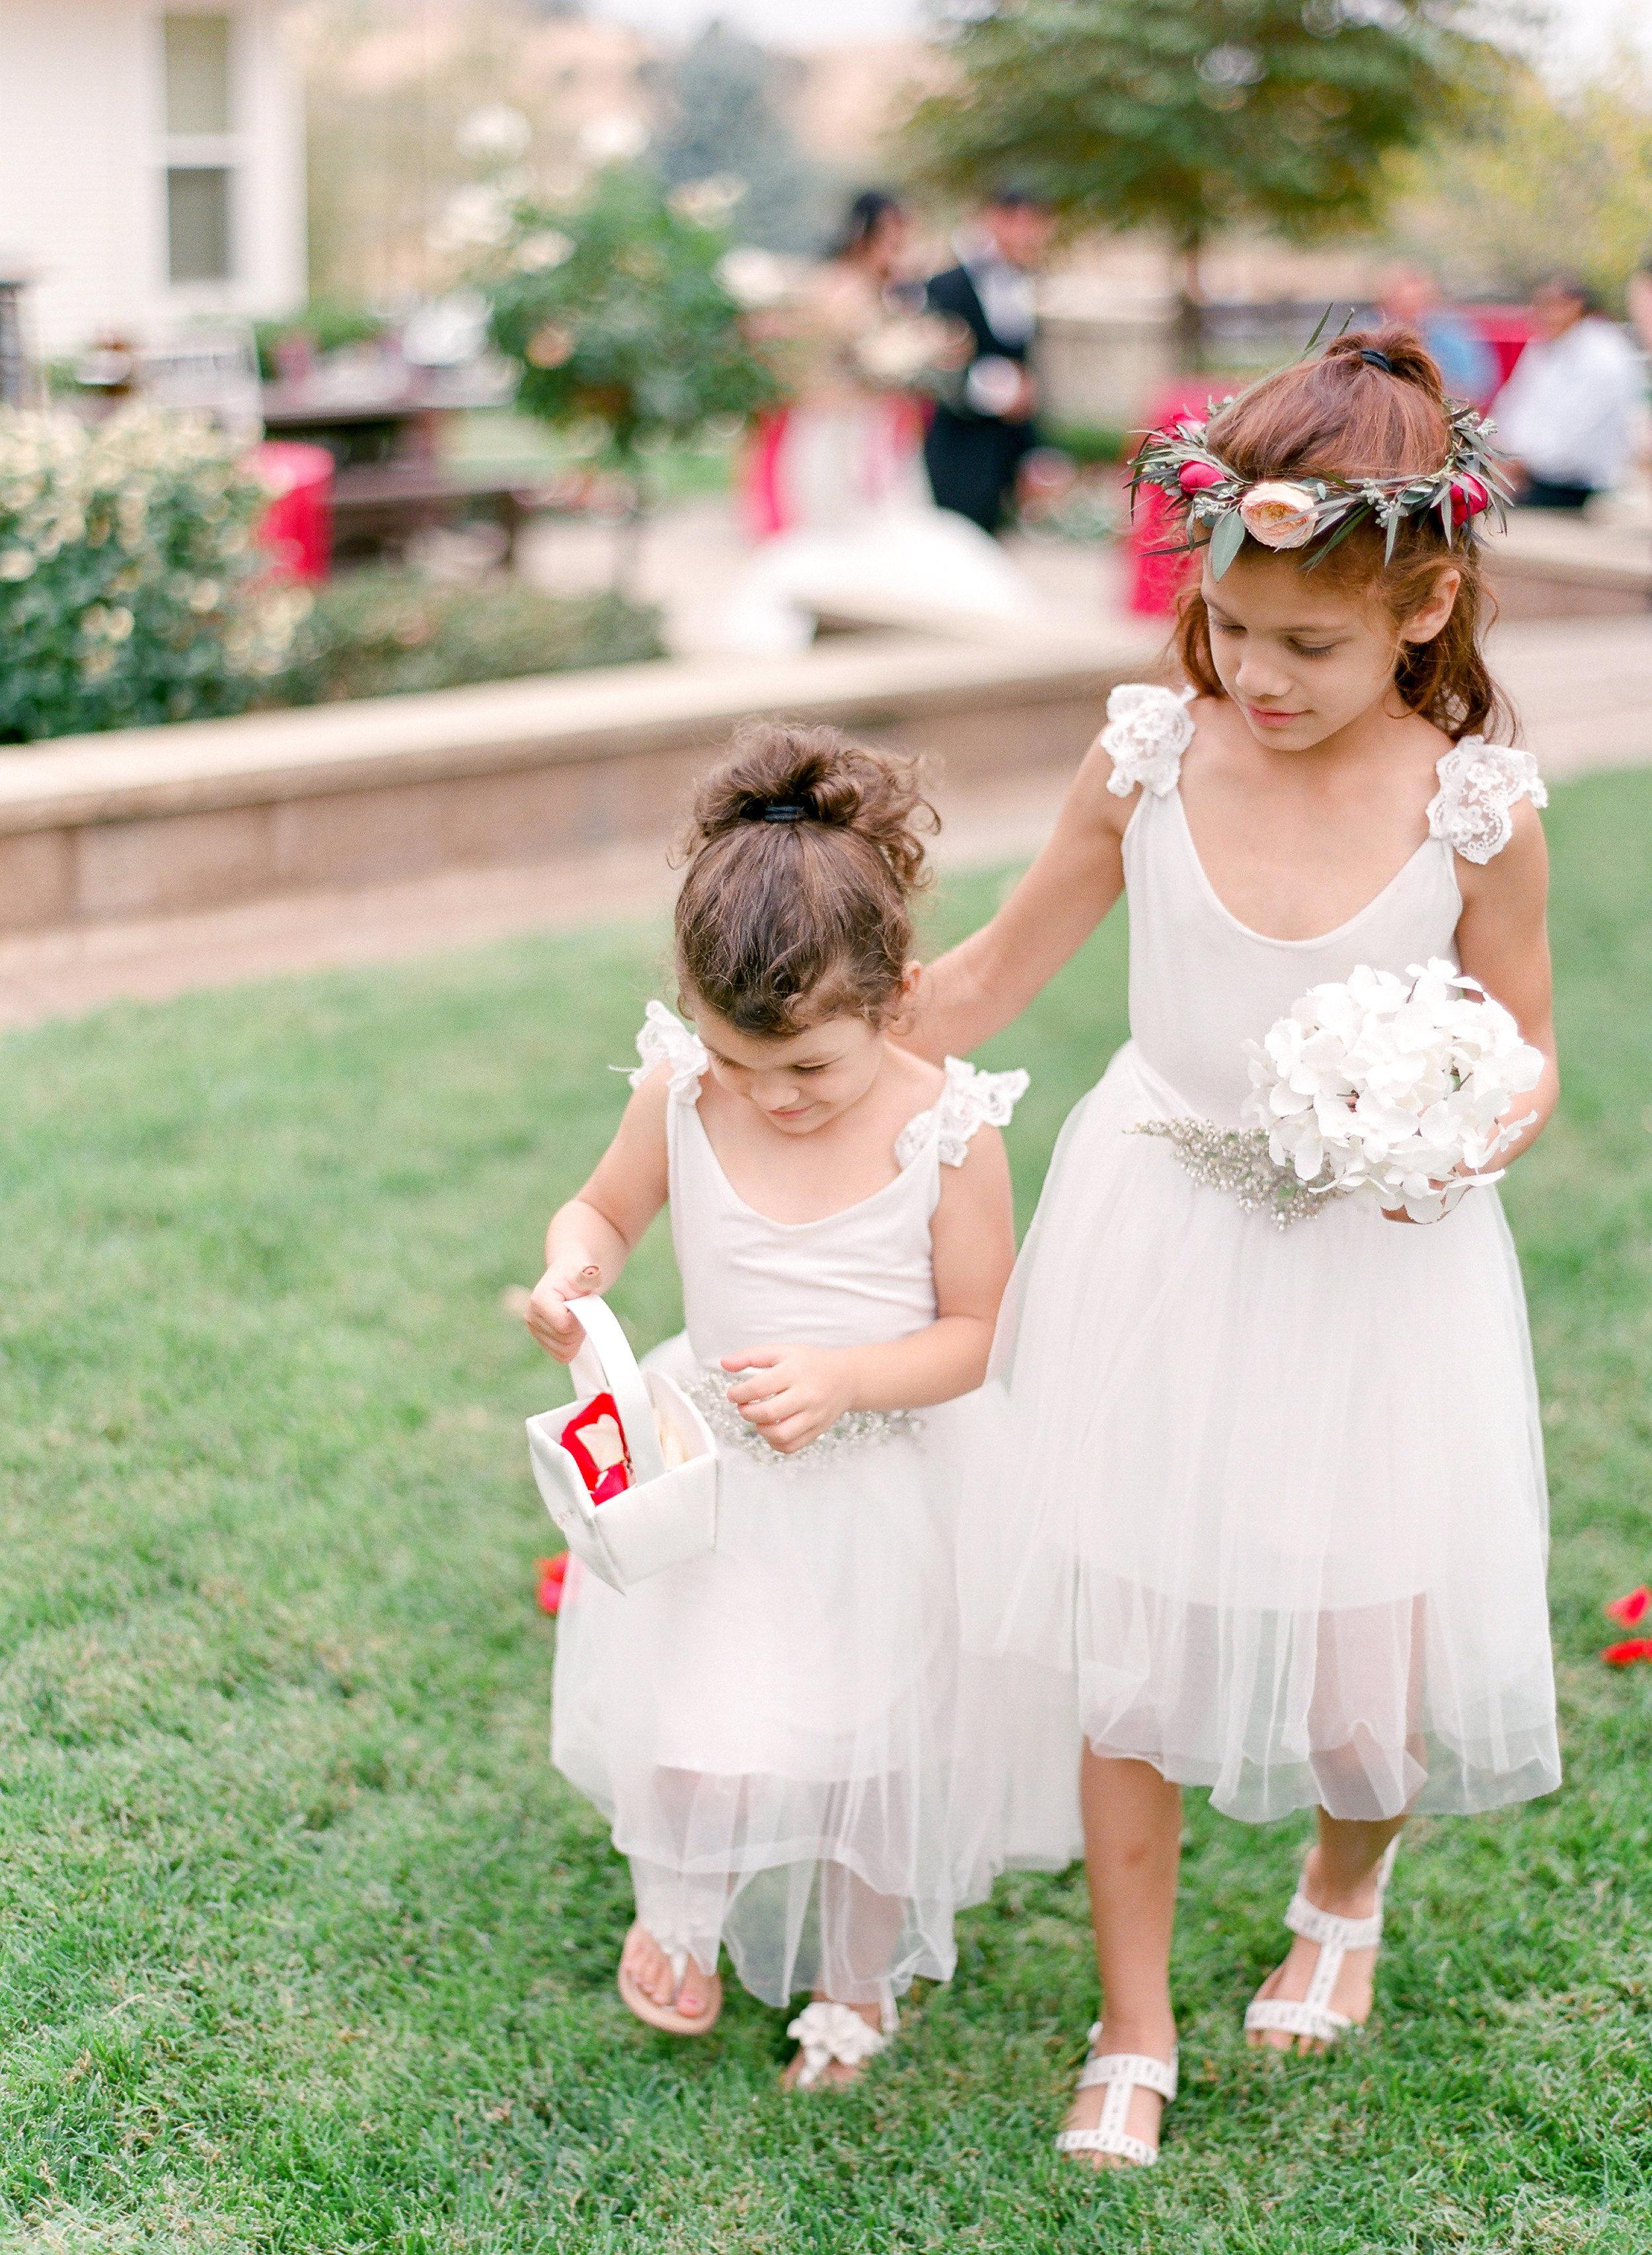 Amador_County_Wedding_Flower_Girls_Petals_Crown_Bouquet_Rancho_Victoria_Vineyard_Northern_California.jpg